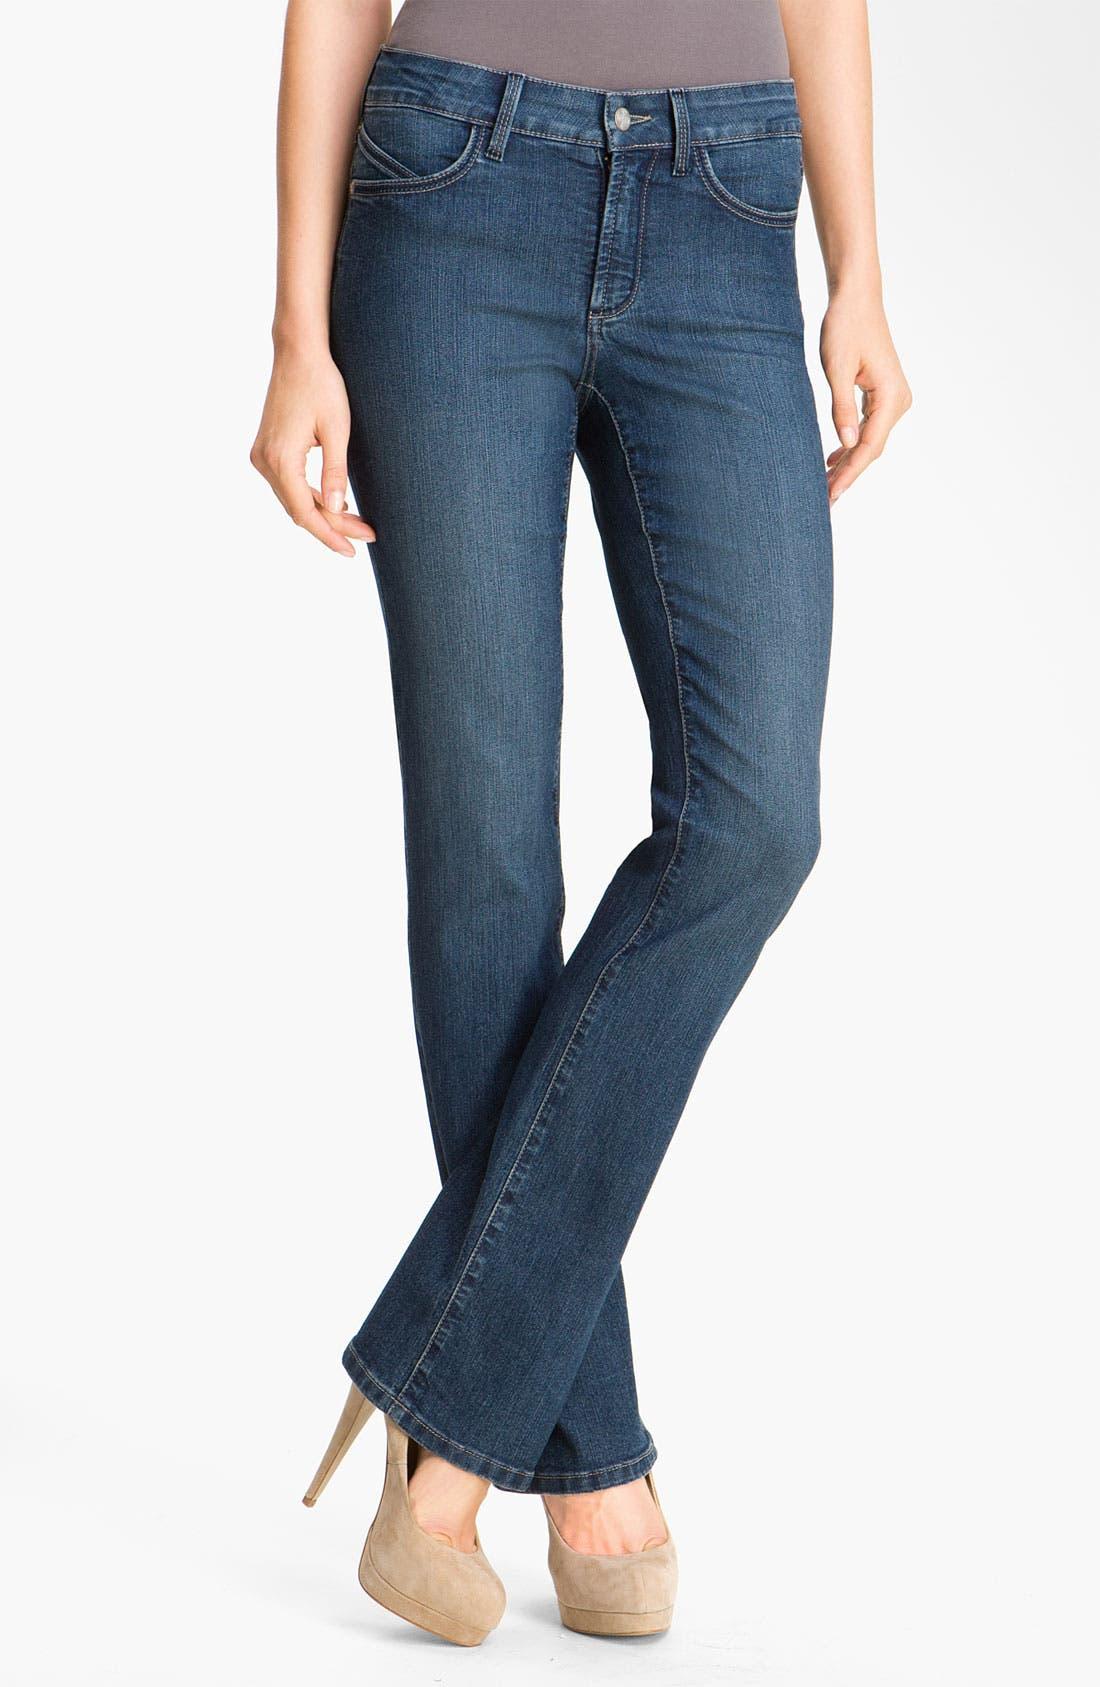 Alternate Image 1 Selected - NYDJ 'Barbara' Embellished Bootcut Stretch Jeans